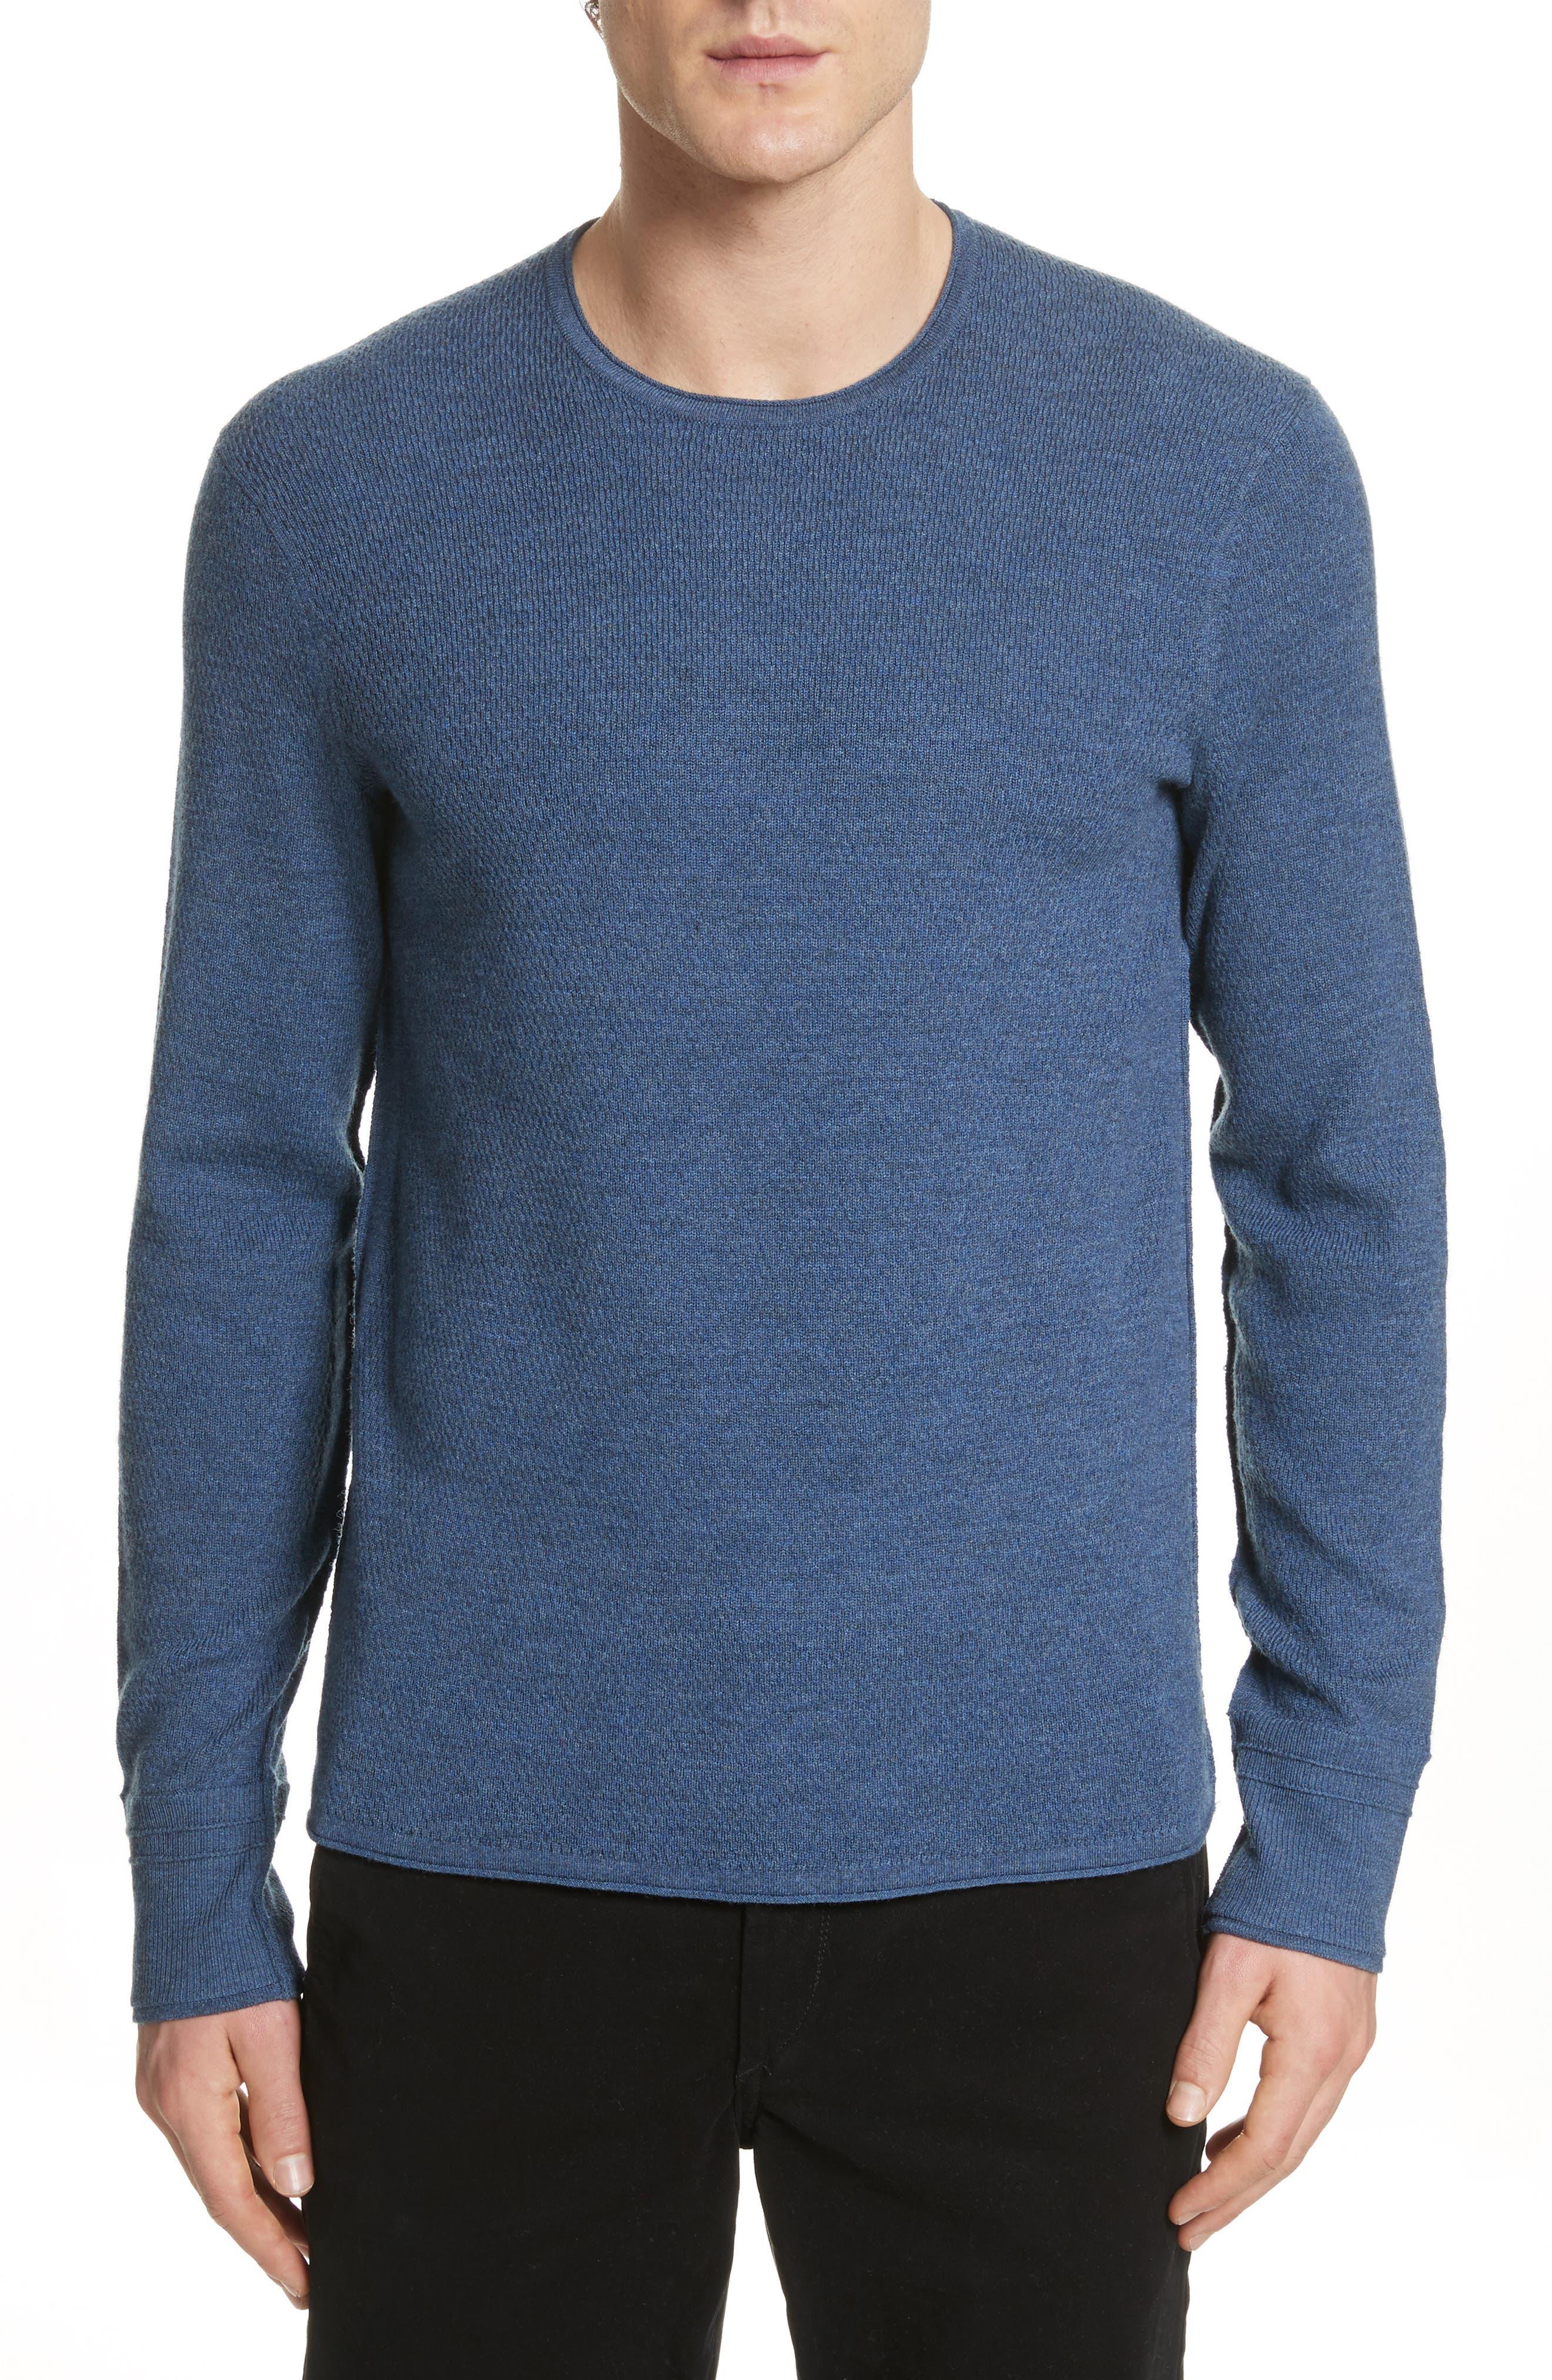 Gregory Merino Wool Blend Crewneck Sweater,                         Main,                         color, Heather Blue